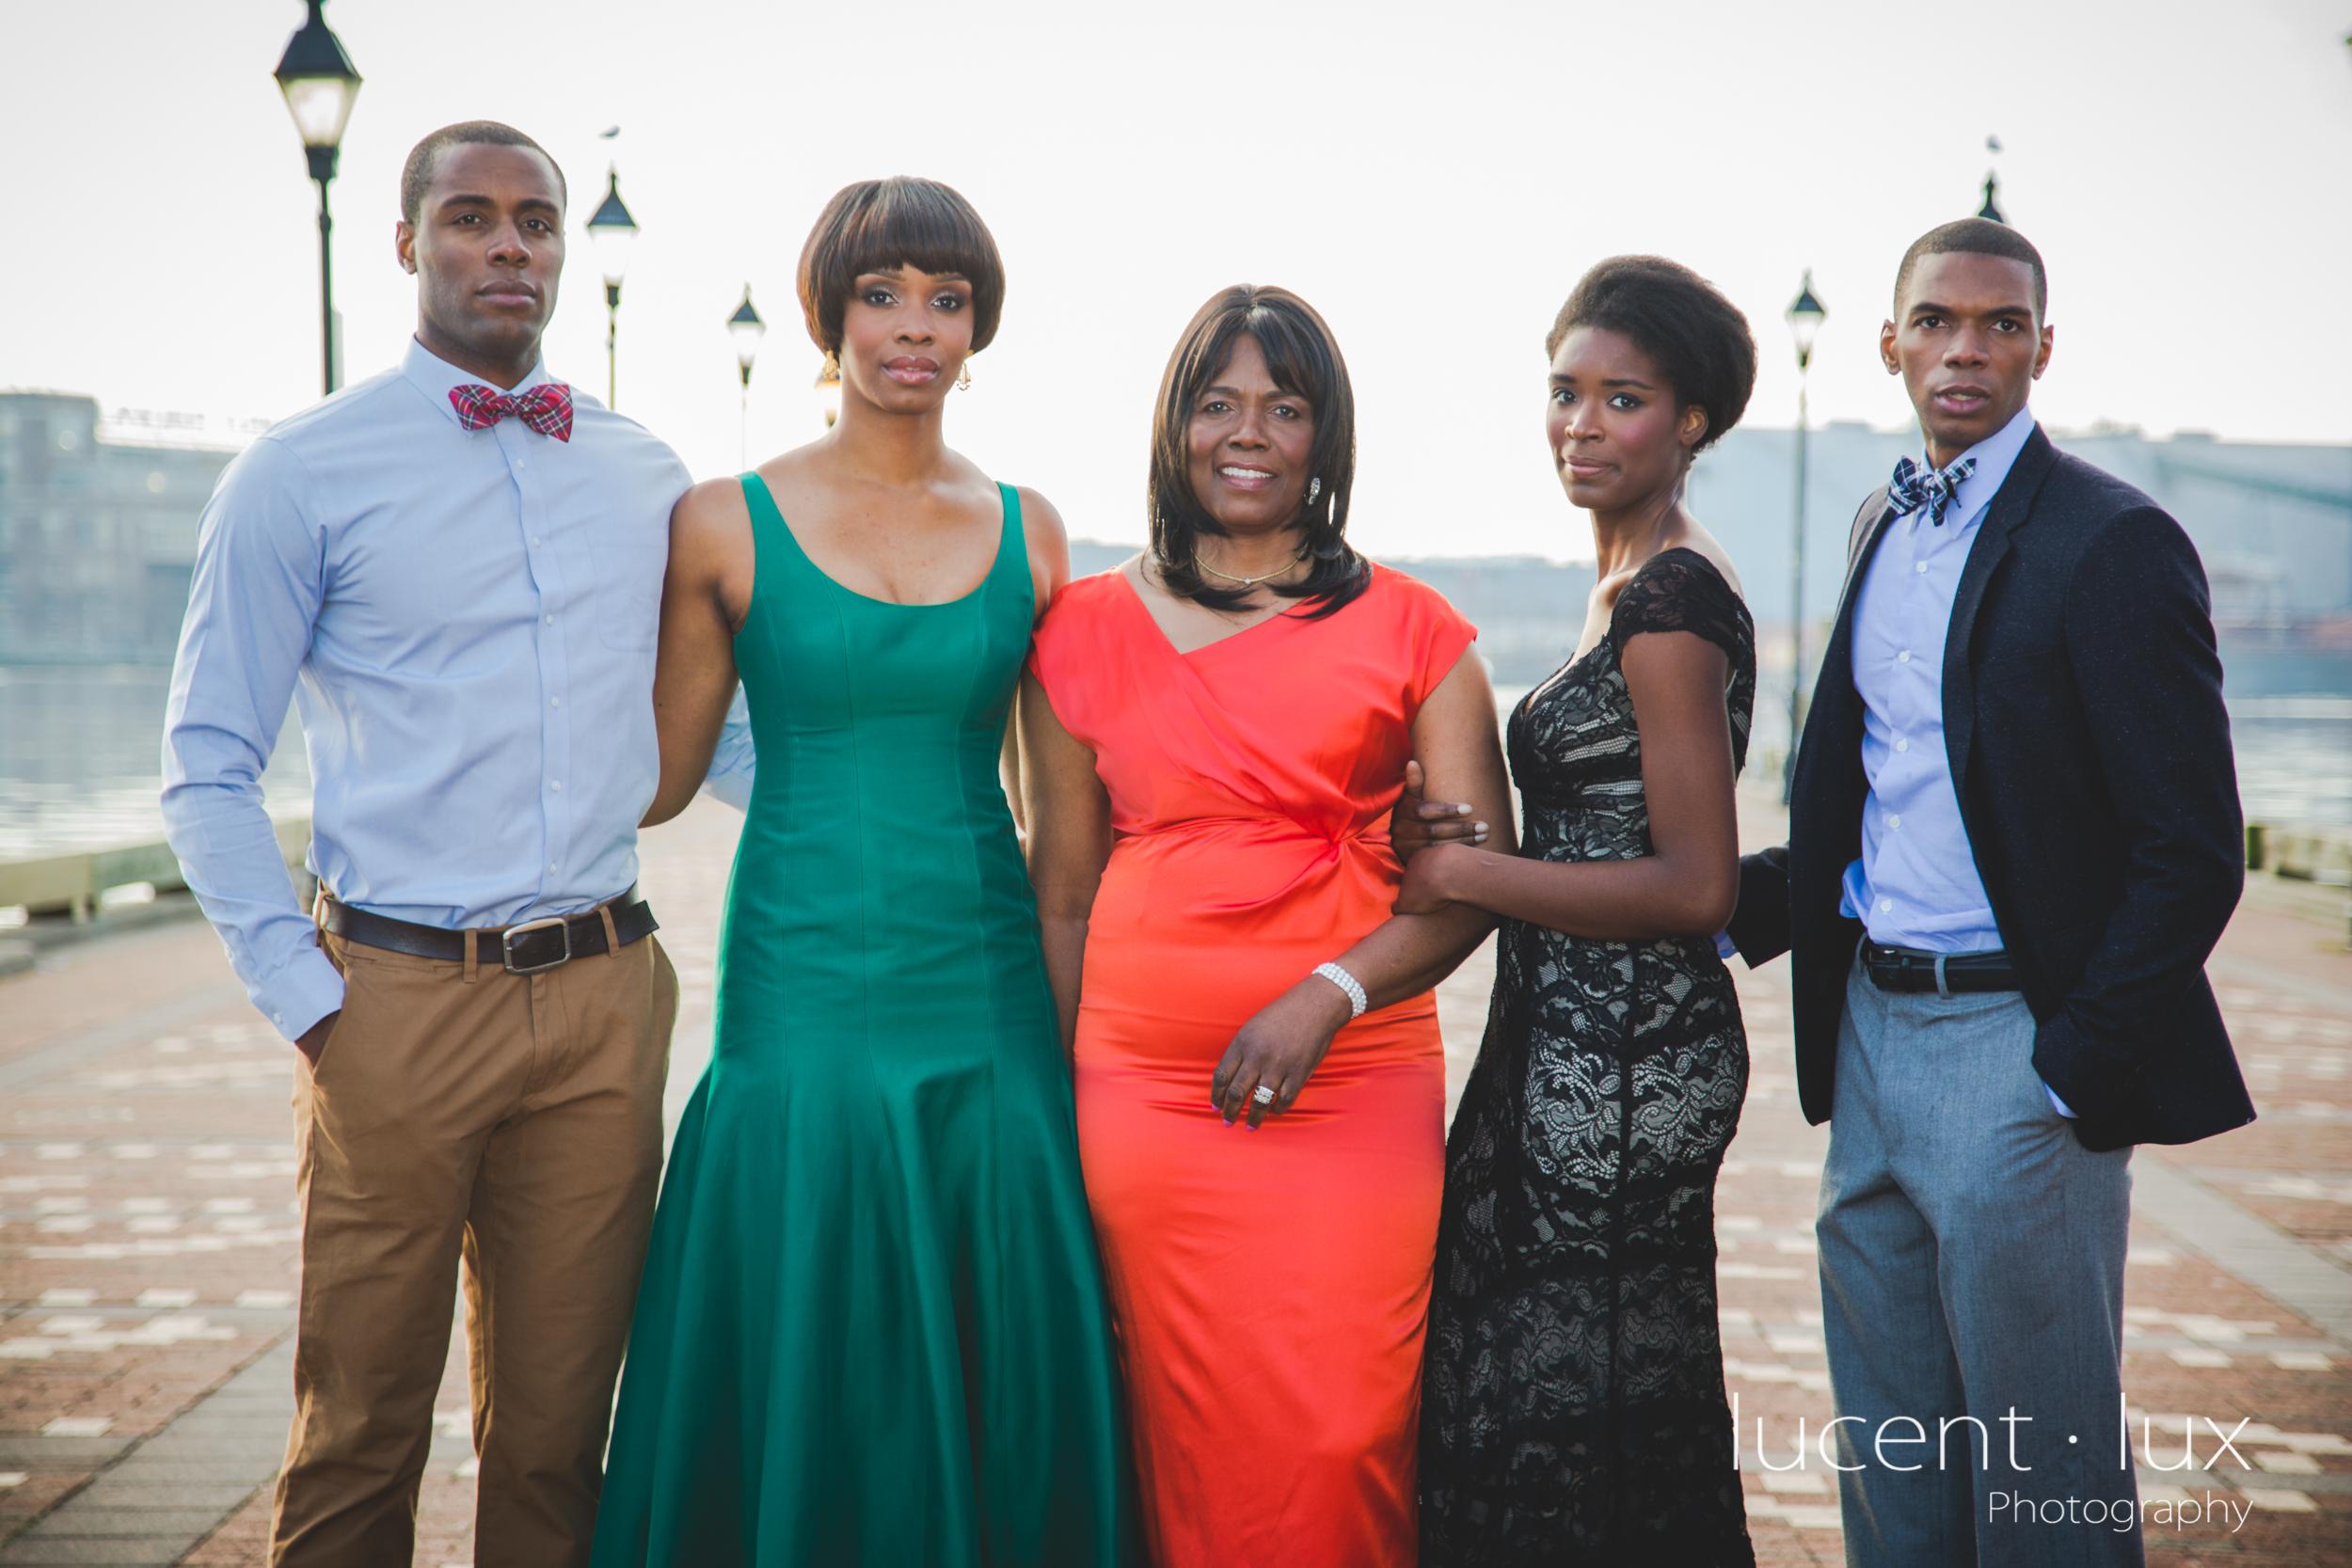 Fells-Point-Baltimore-Maryland-Photography-Photographer-Family-Portraits-Fells-Point-103.jpg